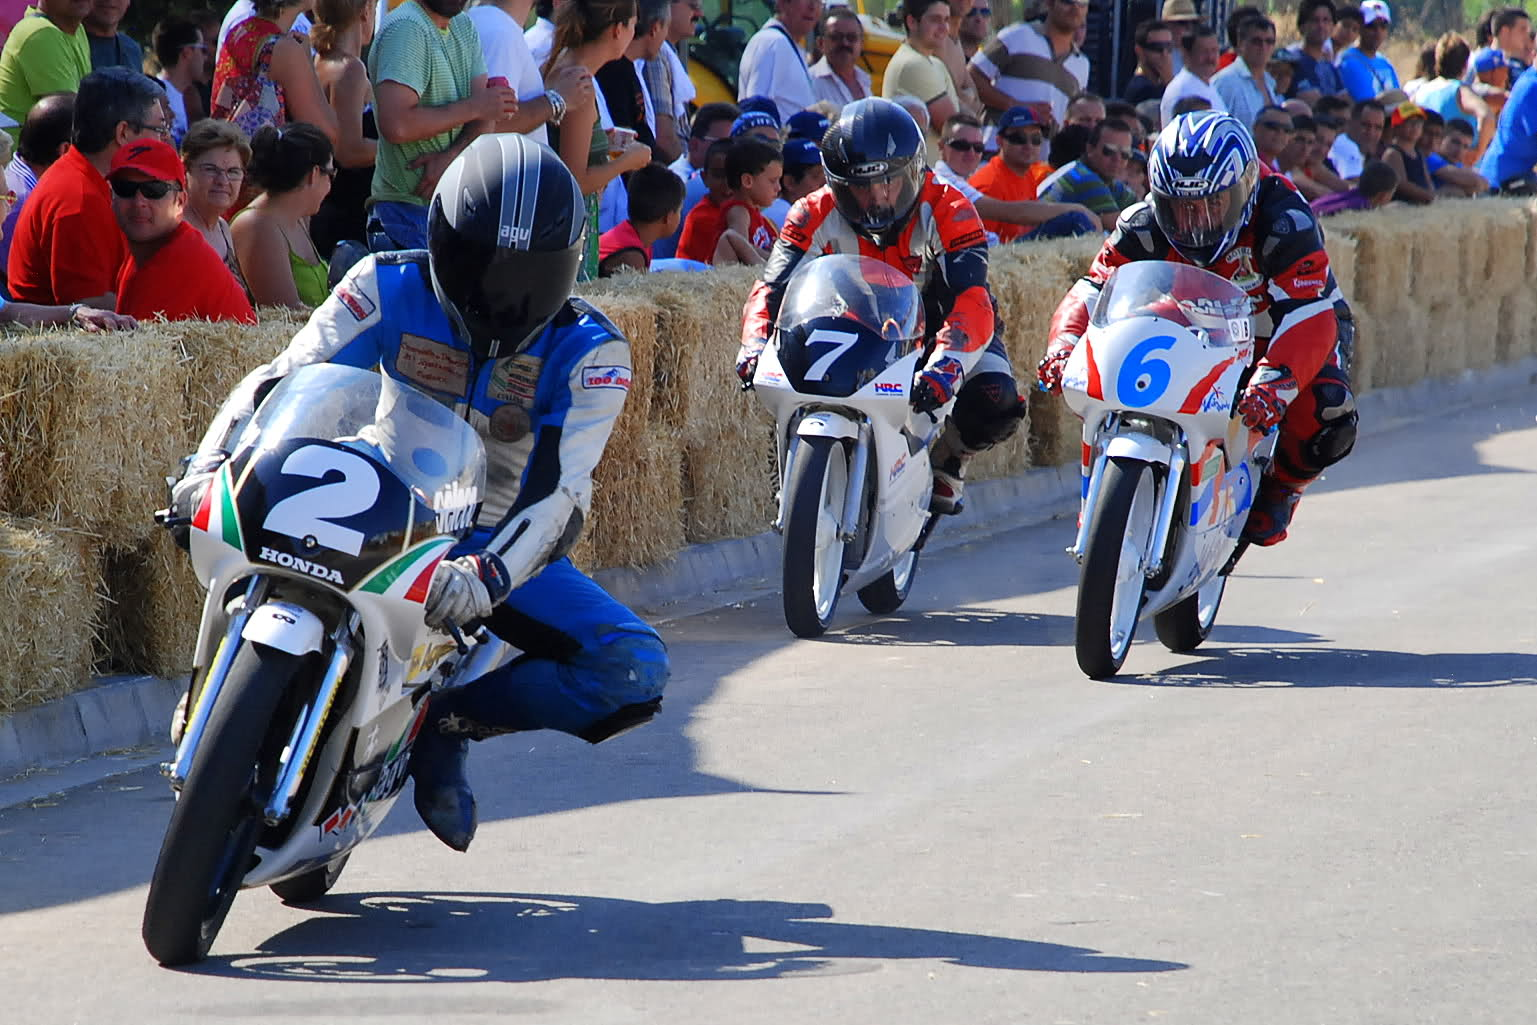 Huvo Casal 80 GP Vicente Rocher. - Página 2 107nbwx